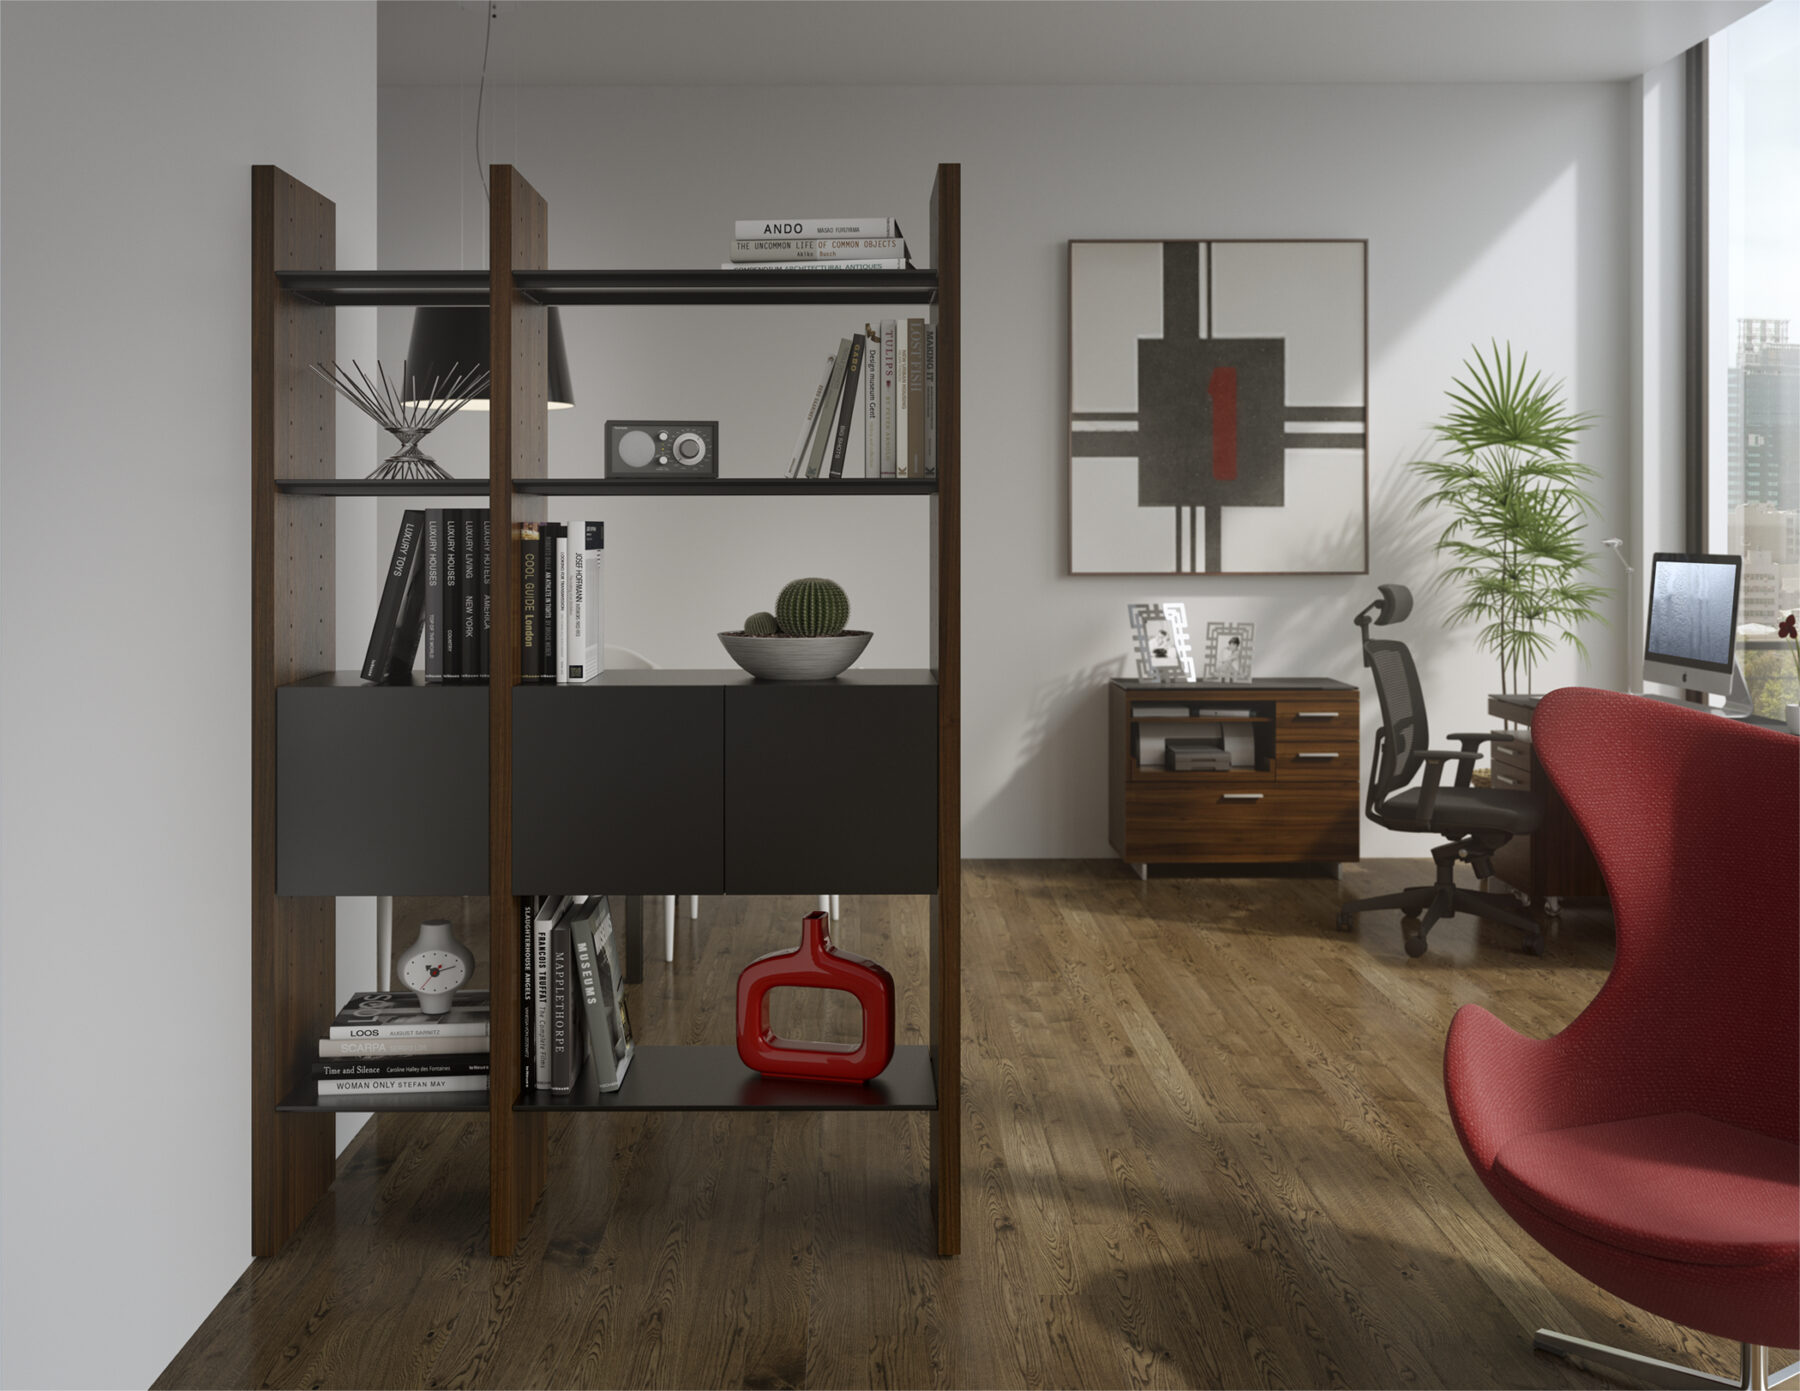 semblance-5402cb-bdi-CWL-modular-storage-system-lifestyle-1